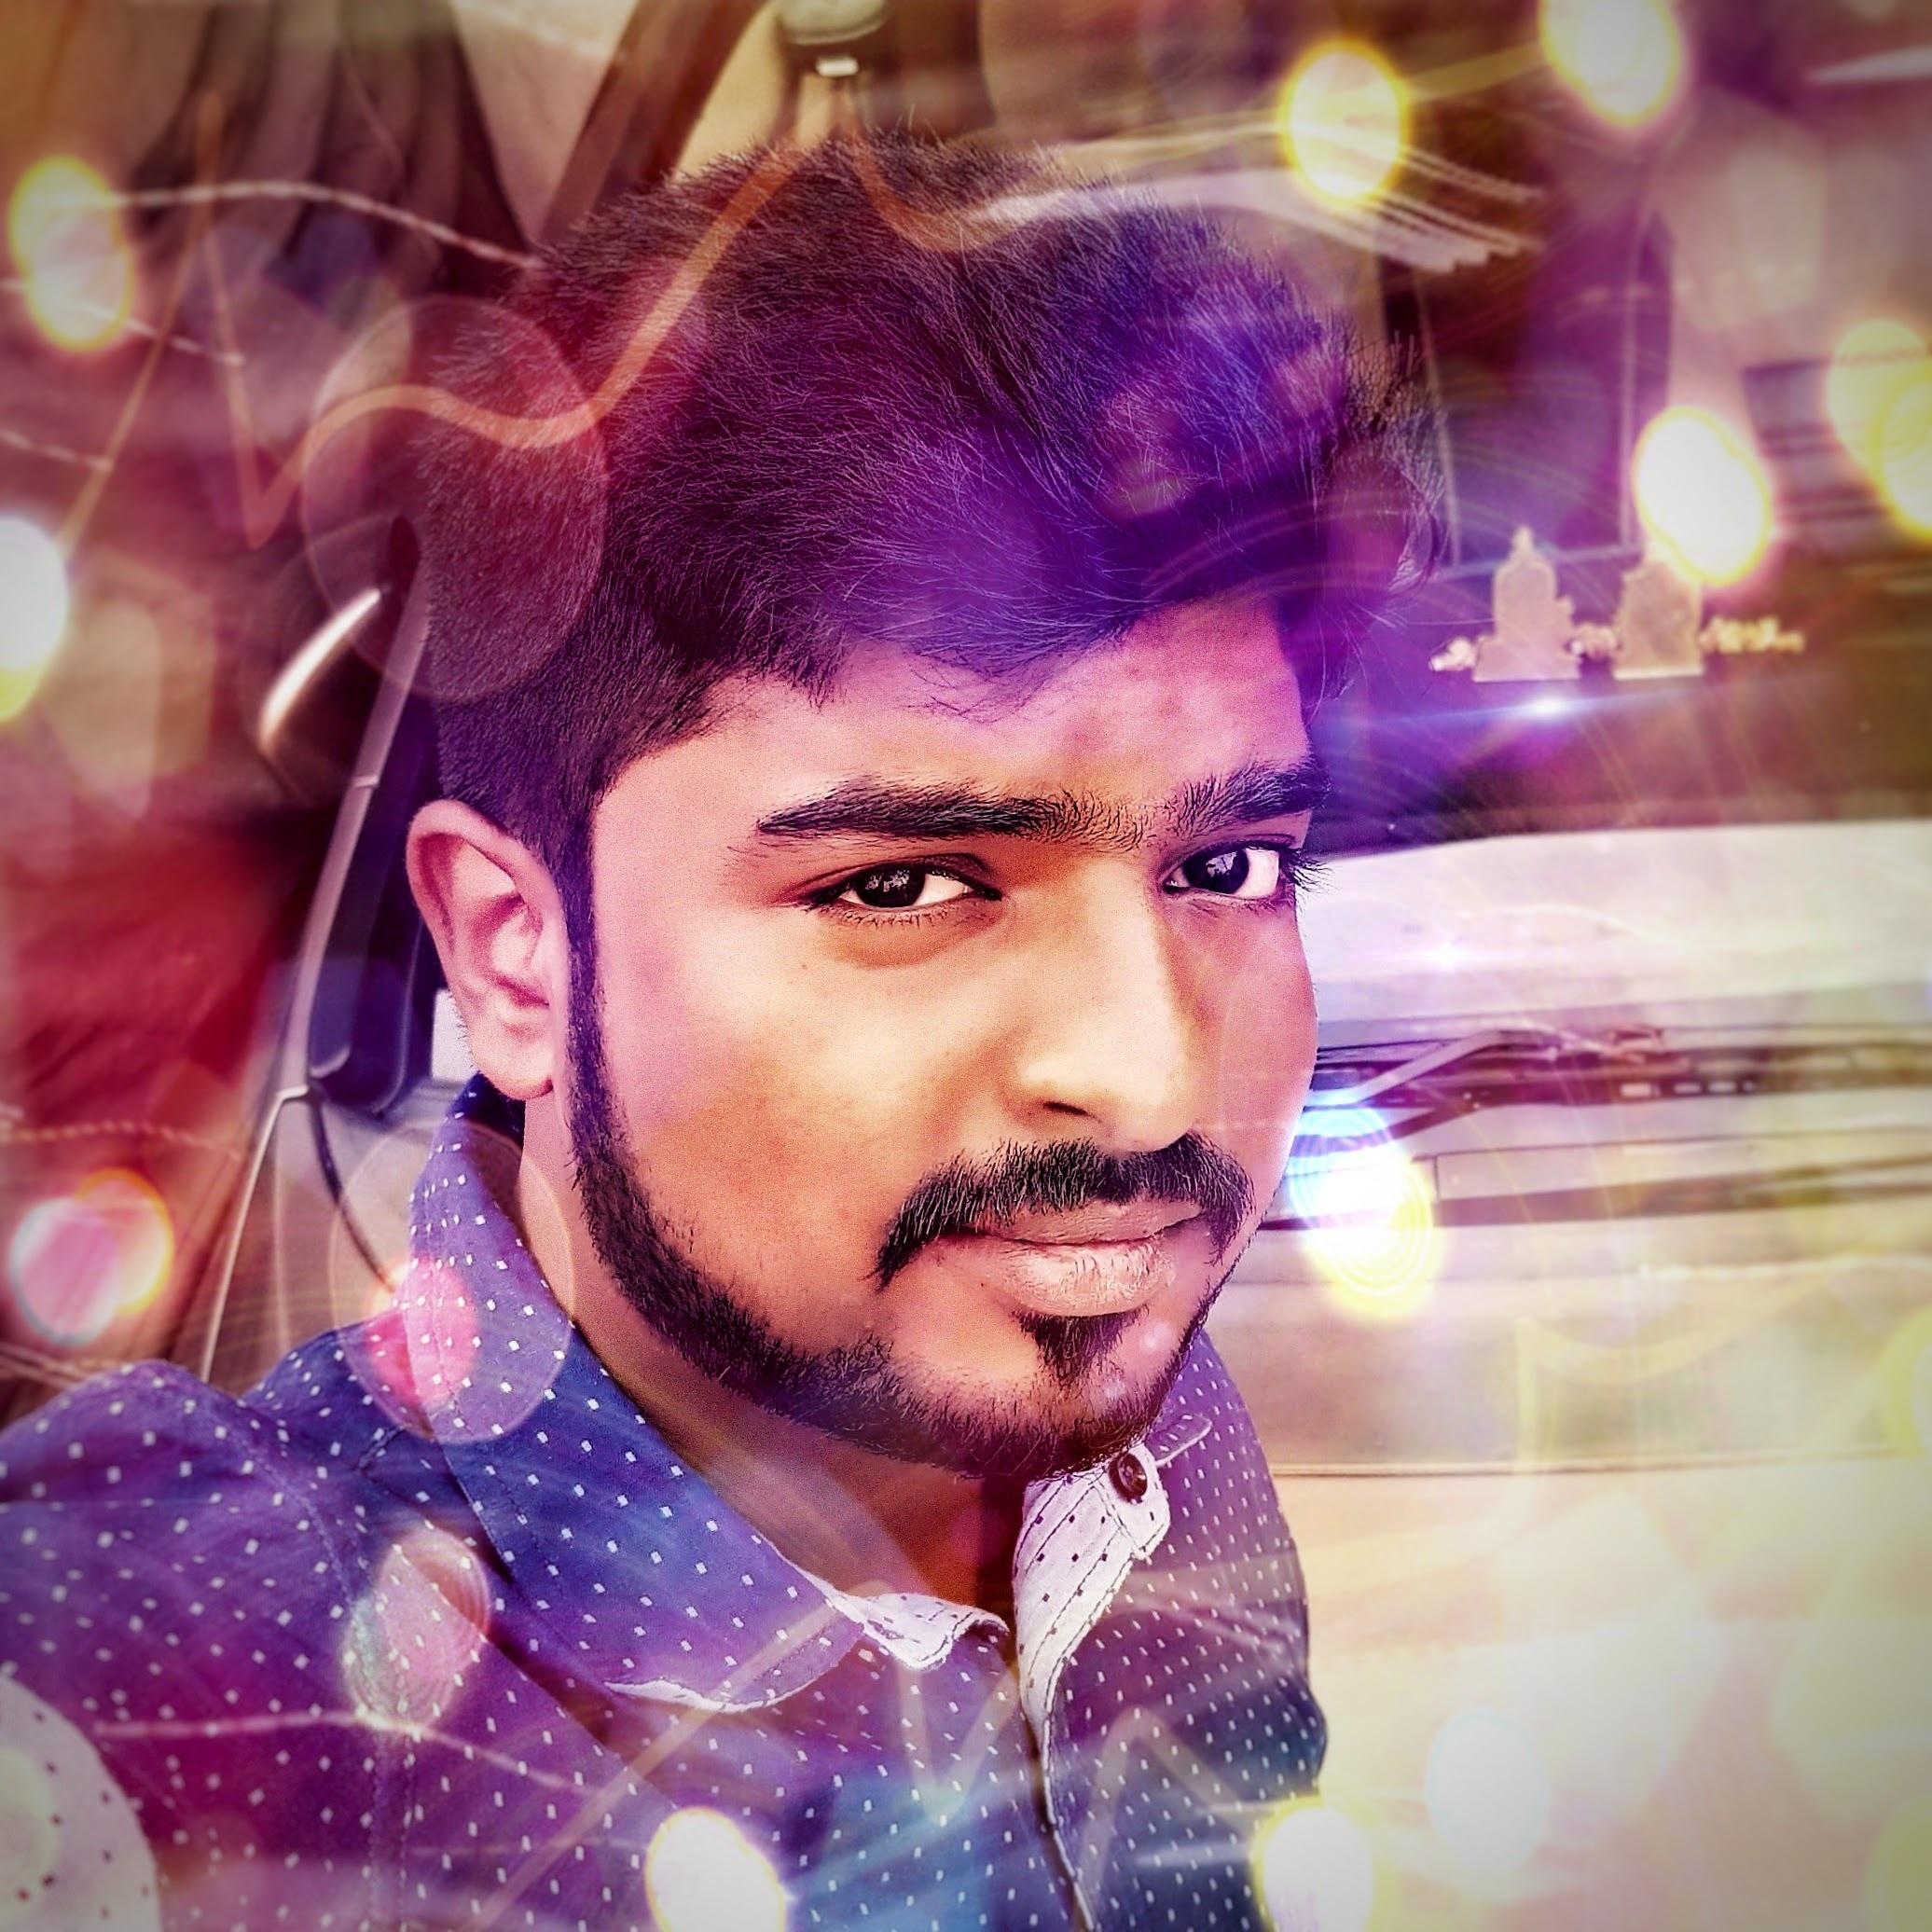 Go to Manoj kumar kasirajan's profile